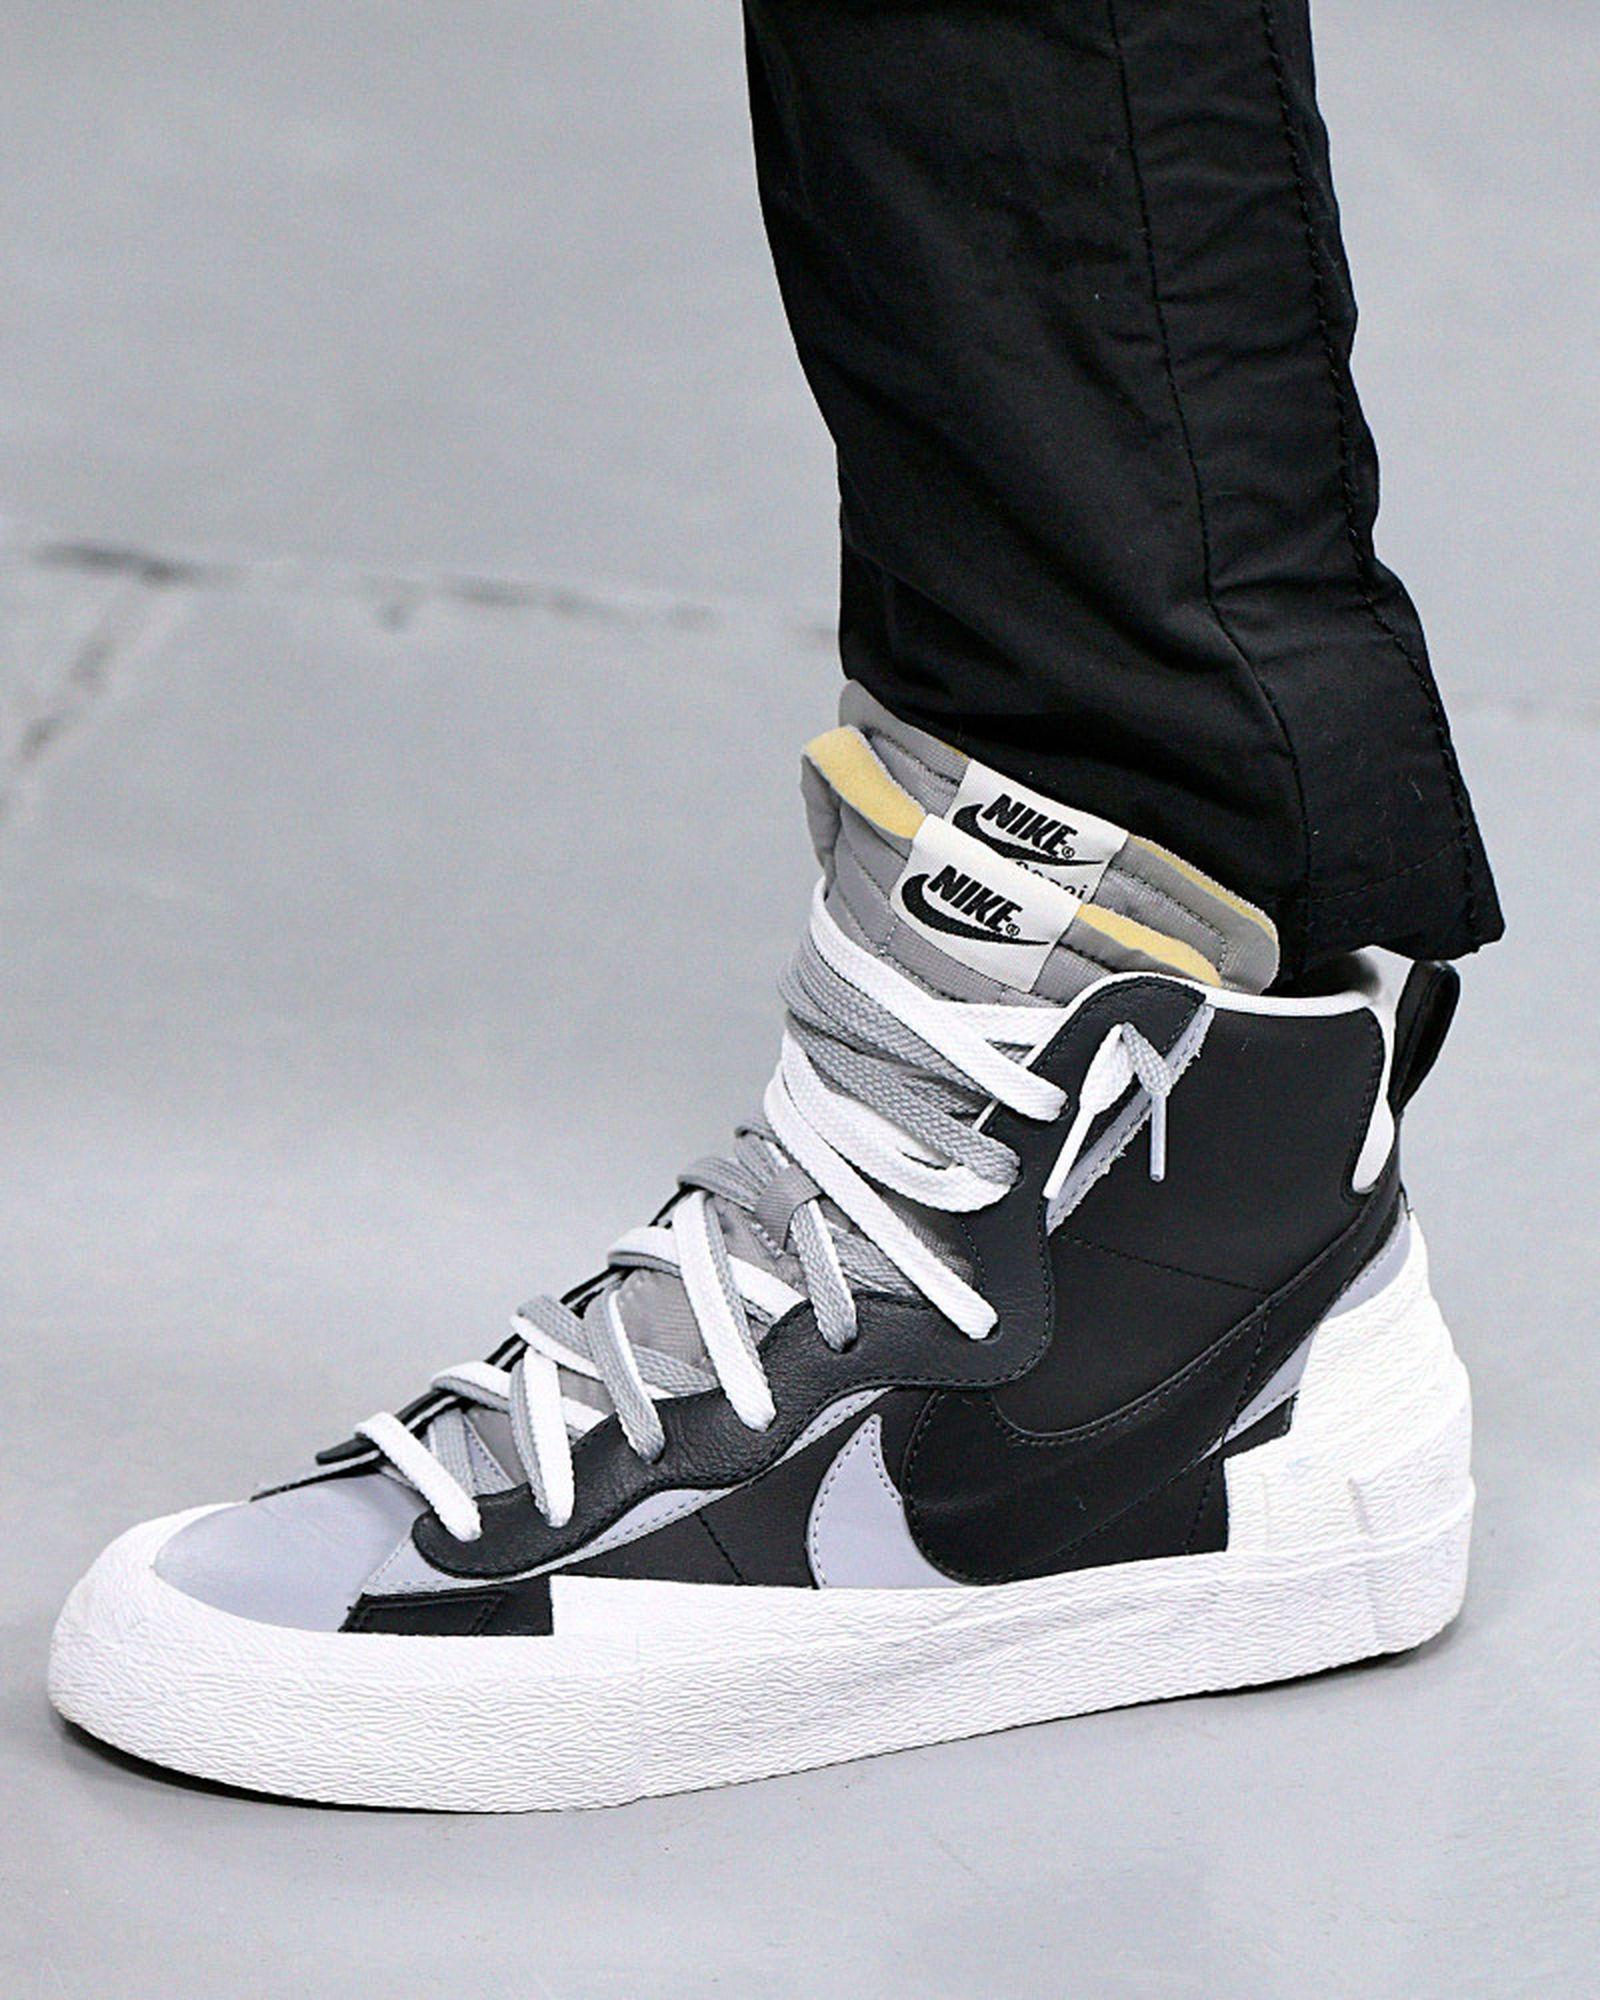 fw19 fashion week sneakers Acne Studios Nike OFF-WHITE c/o Virgil Abloh